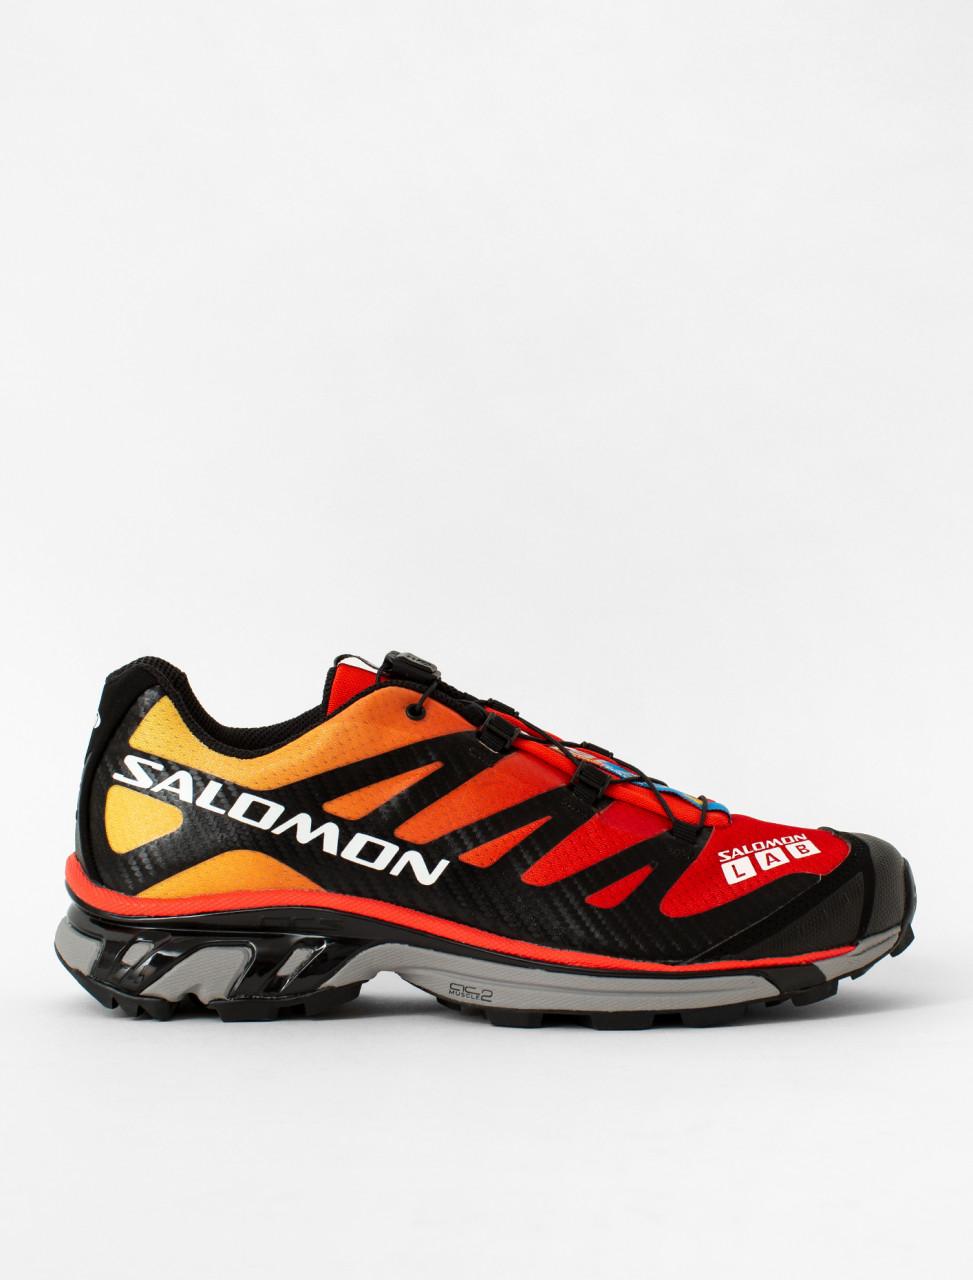 S/LAB XT-4 ADV Sneaker